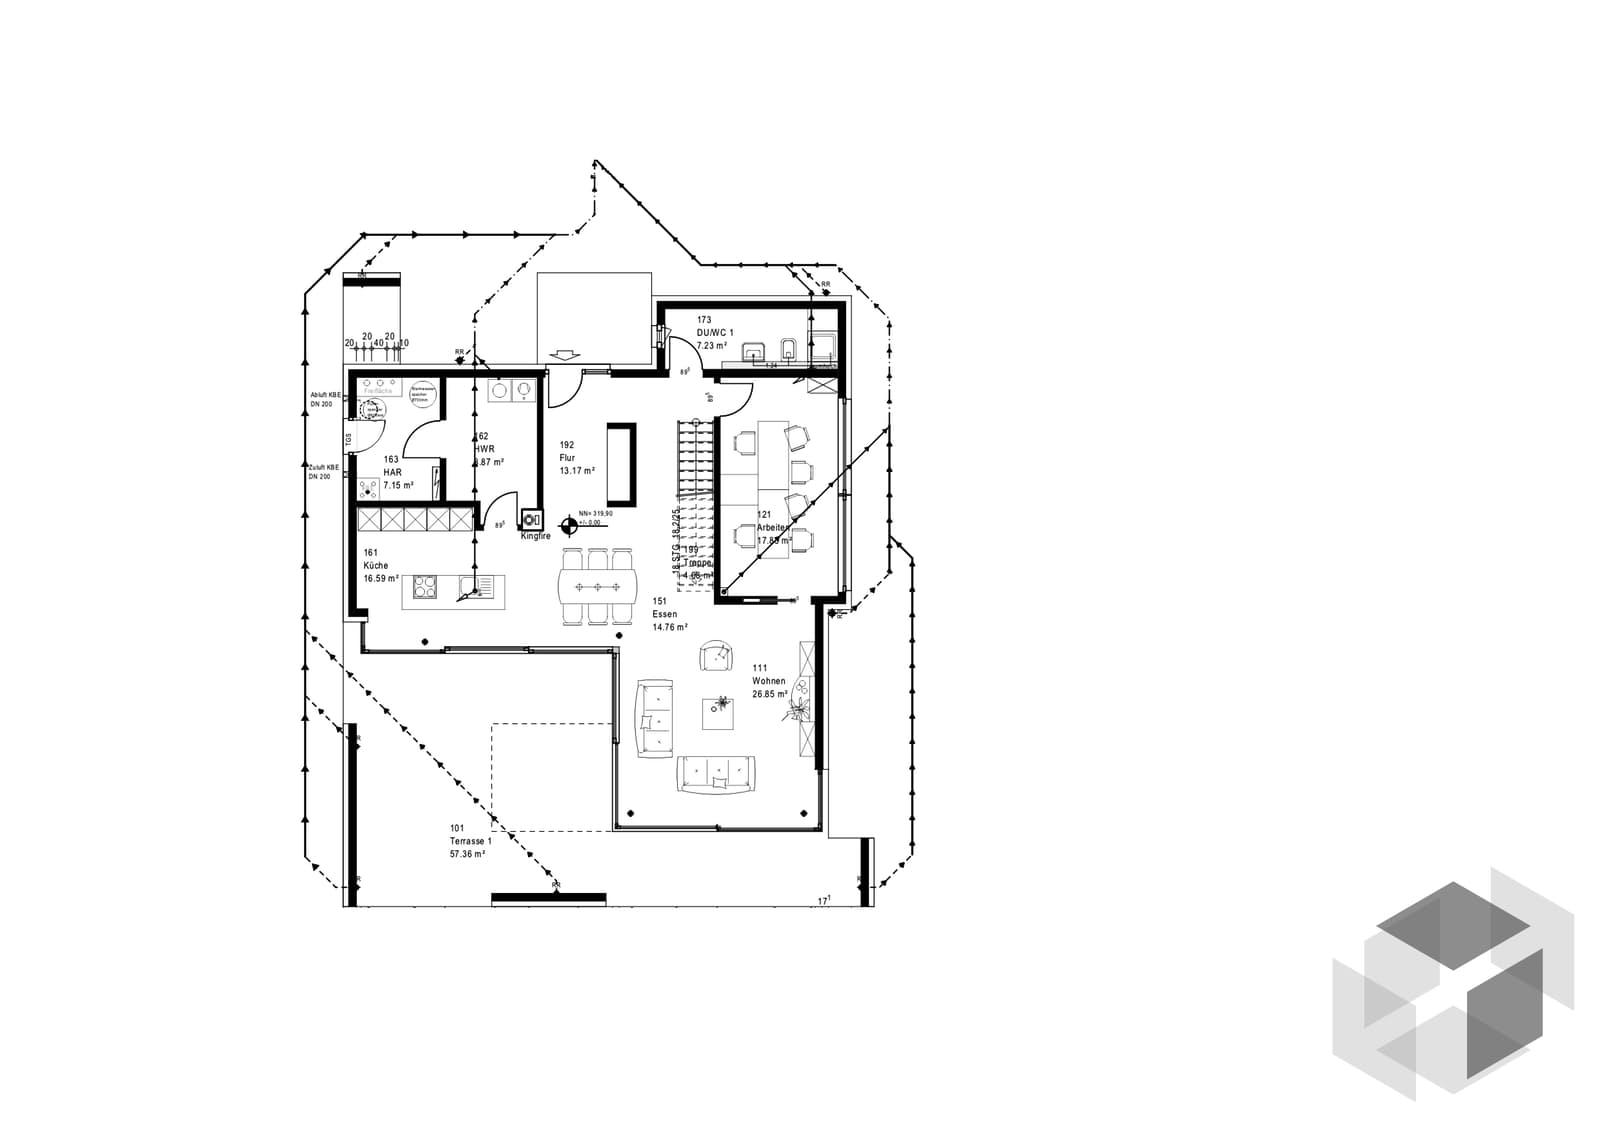 mh wuppertal von okal haus komplette daten bersicht. Black Bedroom Furniture Sets. Home Design Ideas